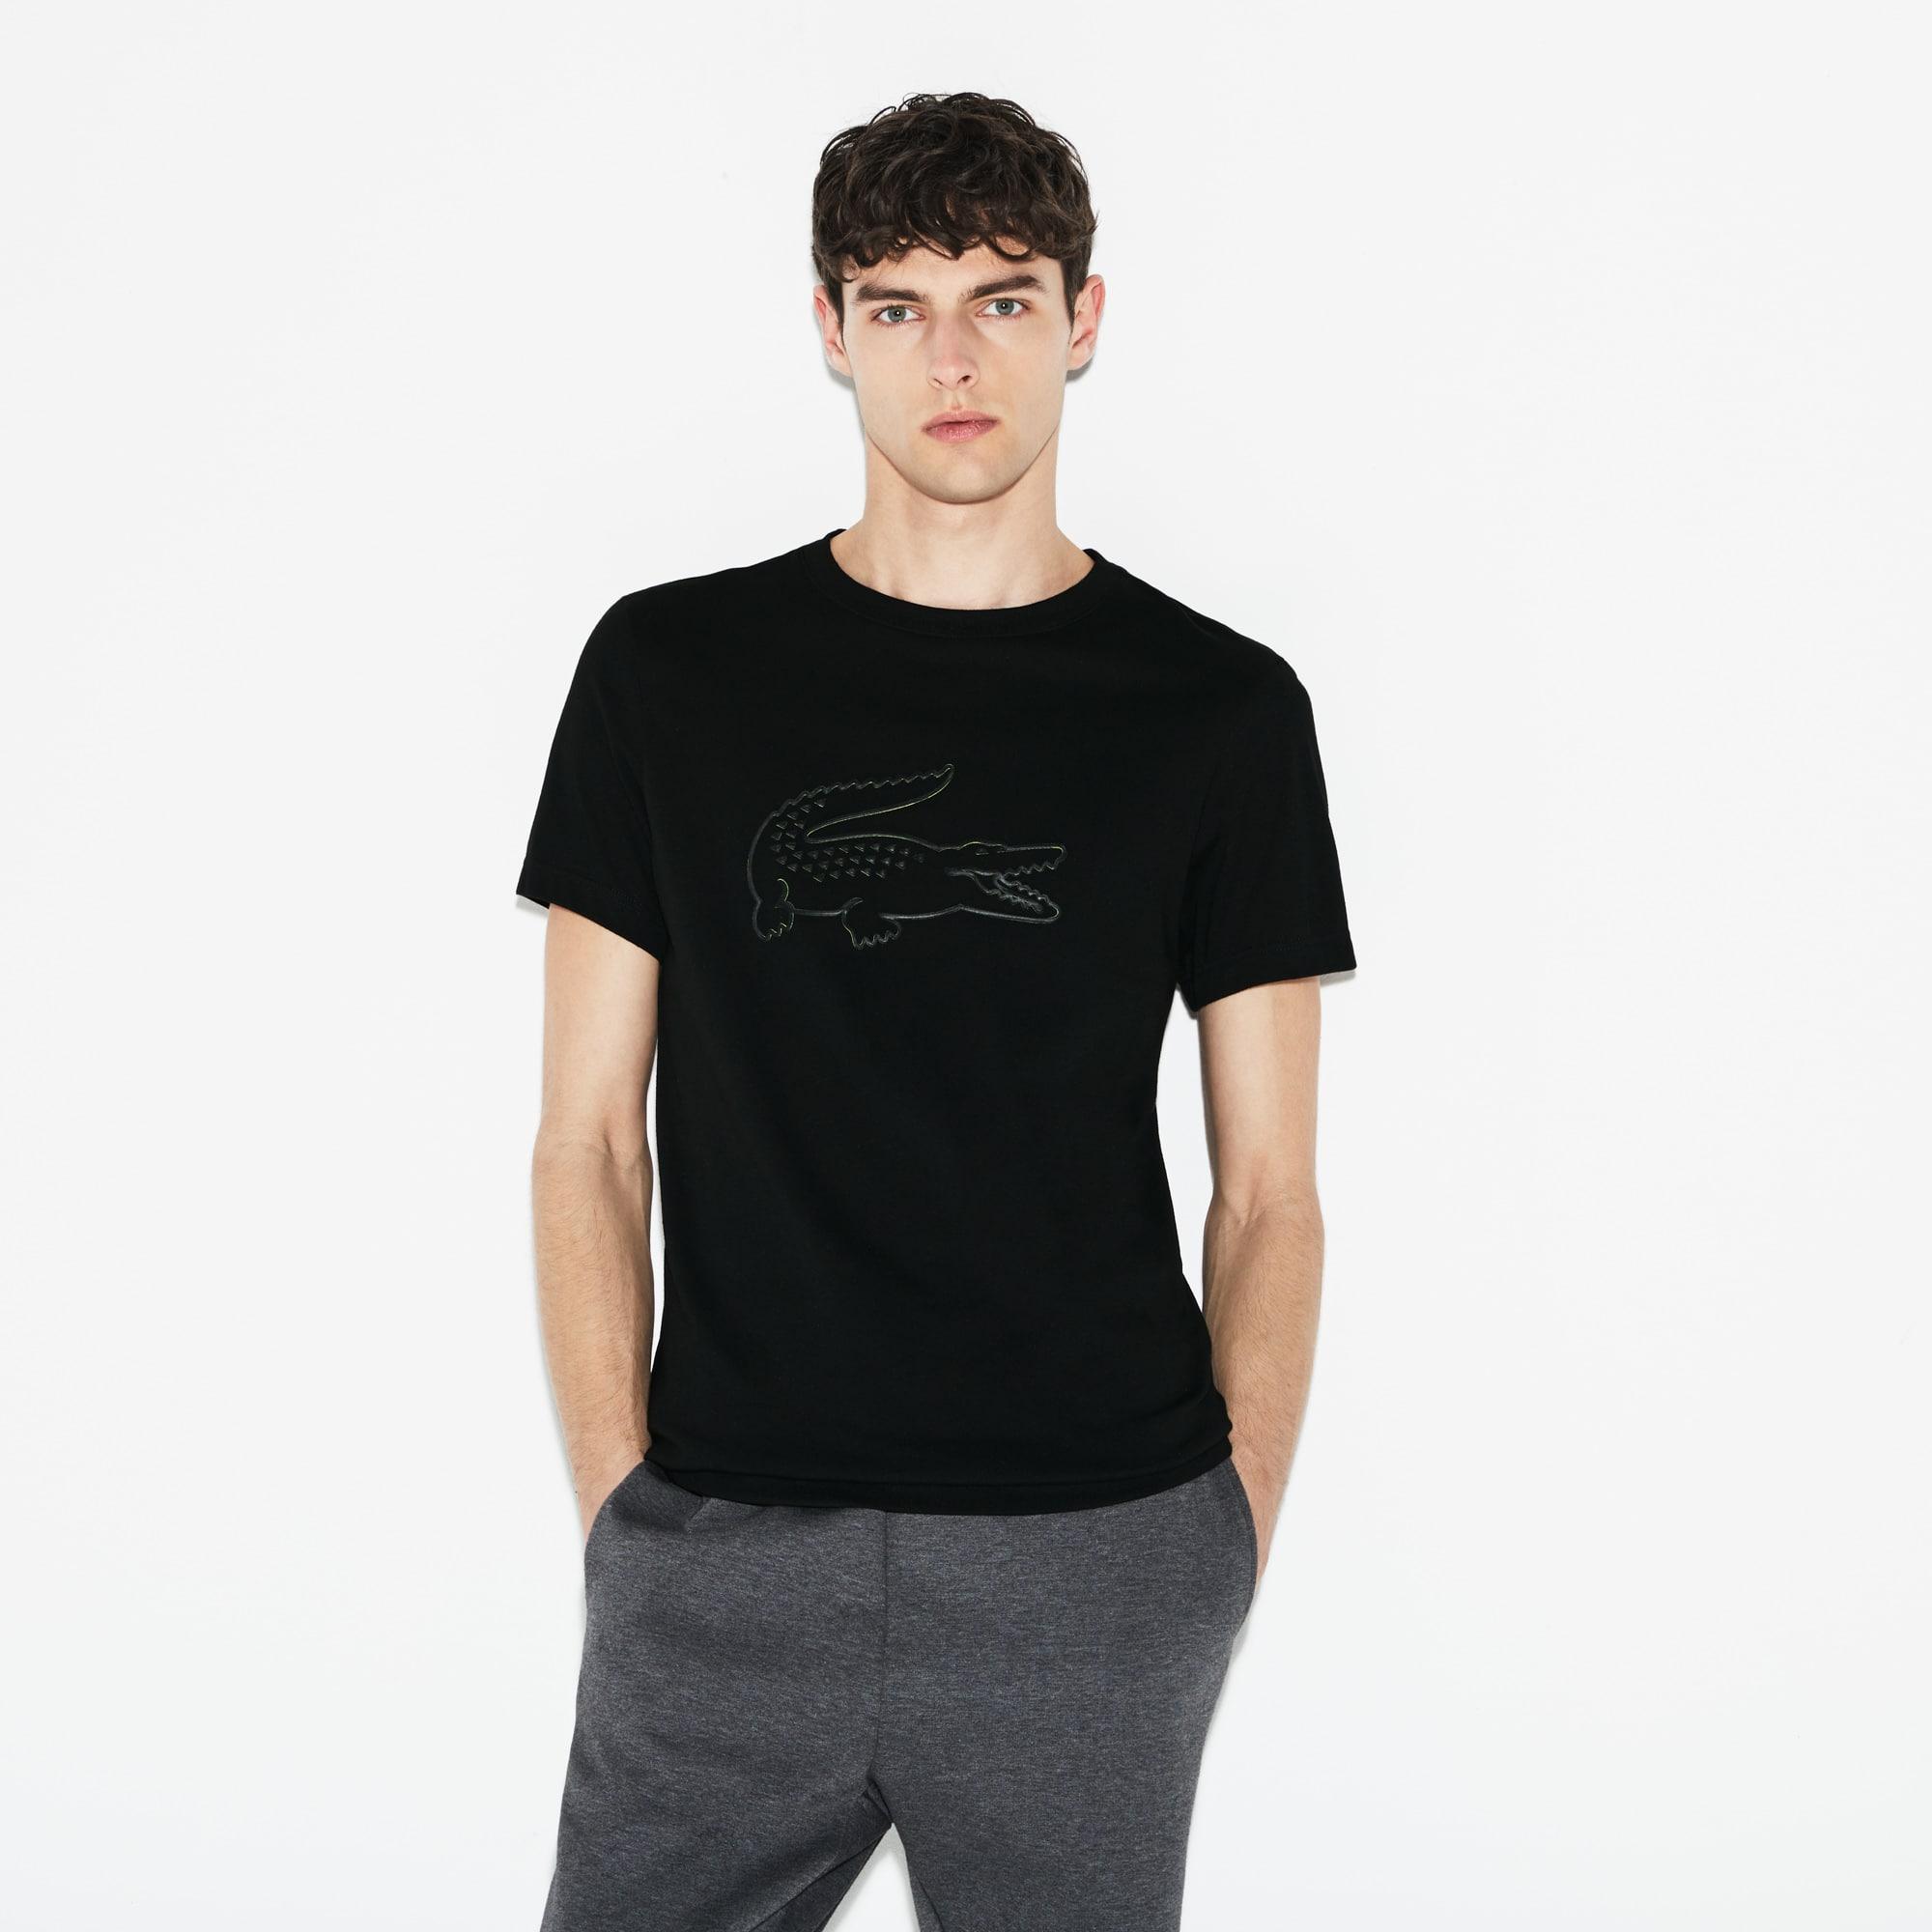 Lacoste SPORT Tennis-T-shirt heren jersey technisch met oversized krokodil